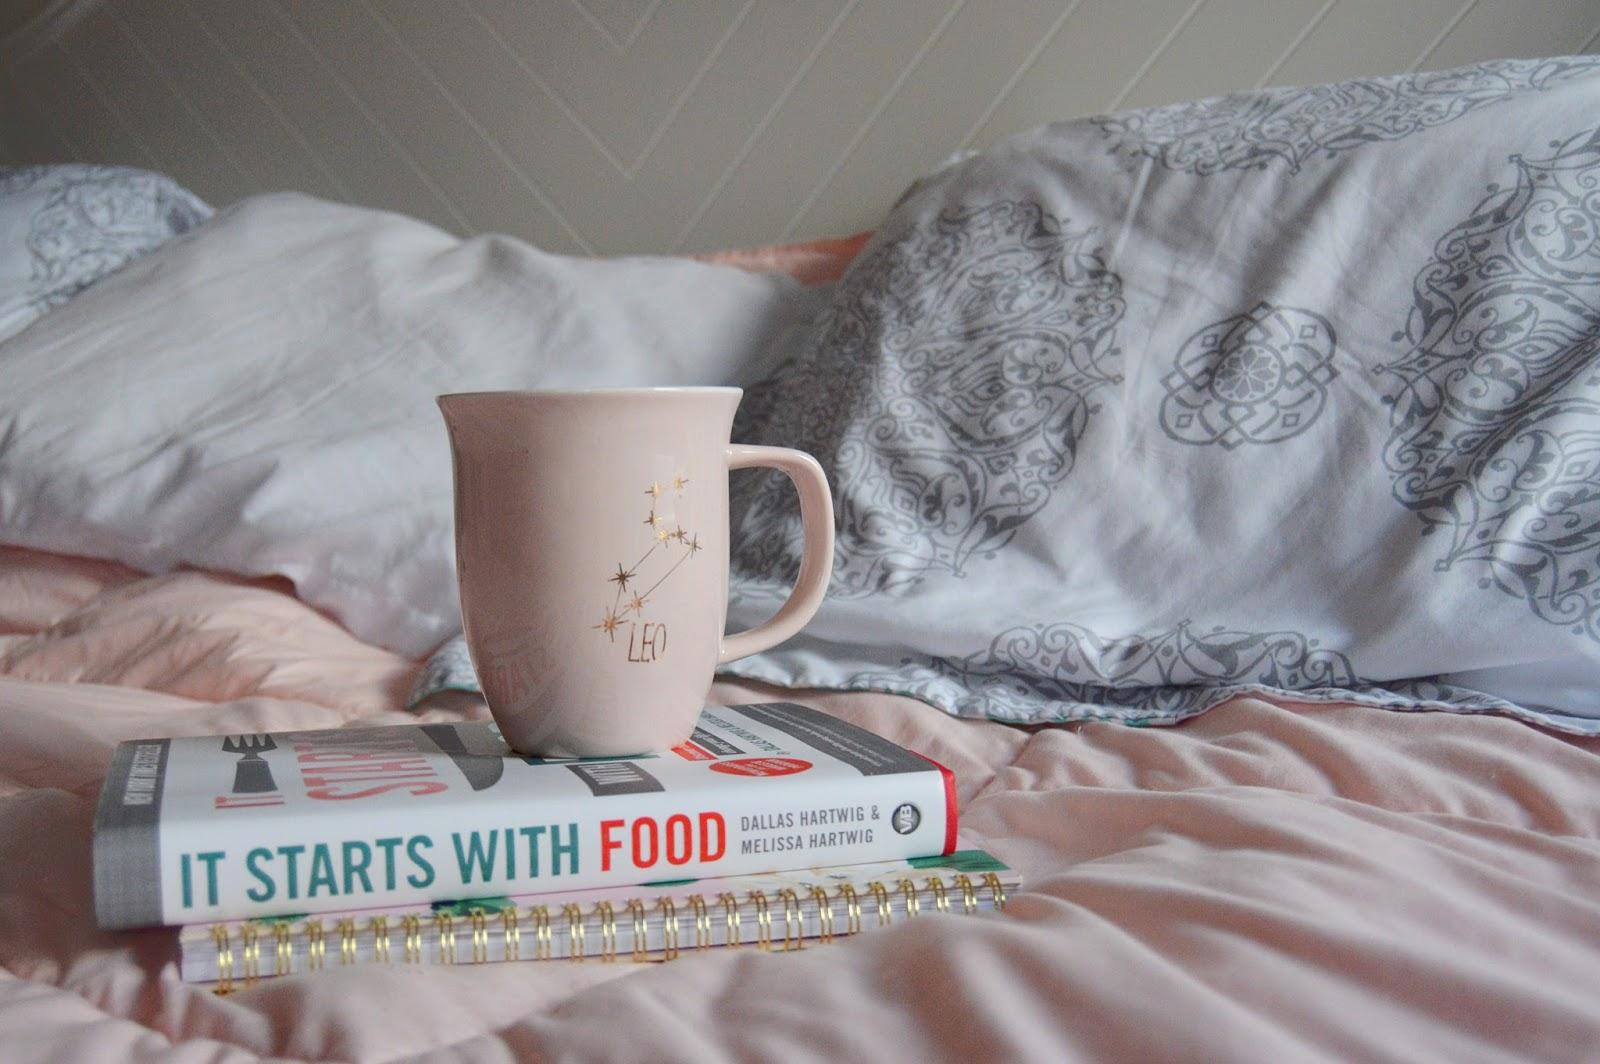 bedtime routine, sleep hygiene, sleep